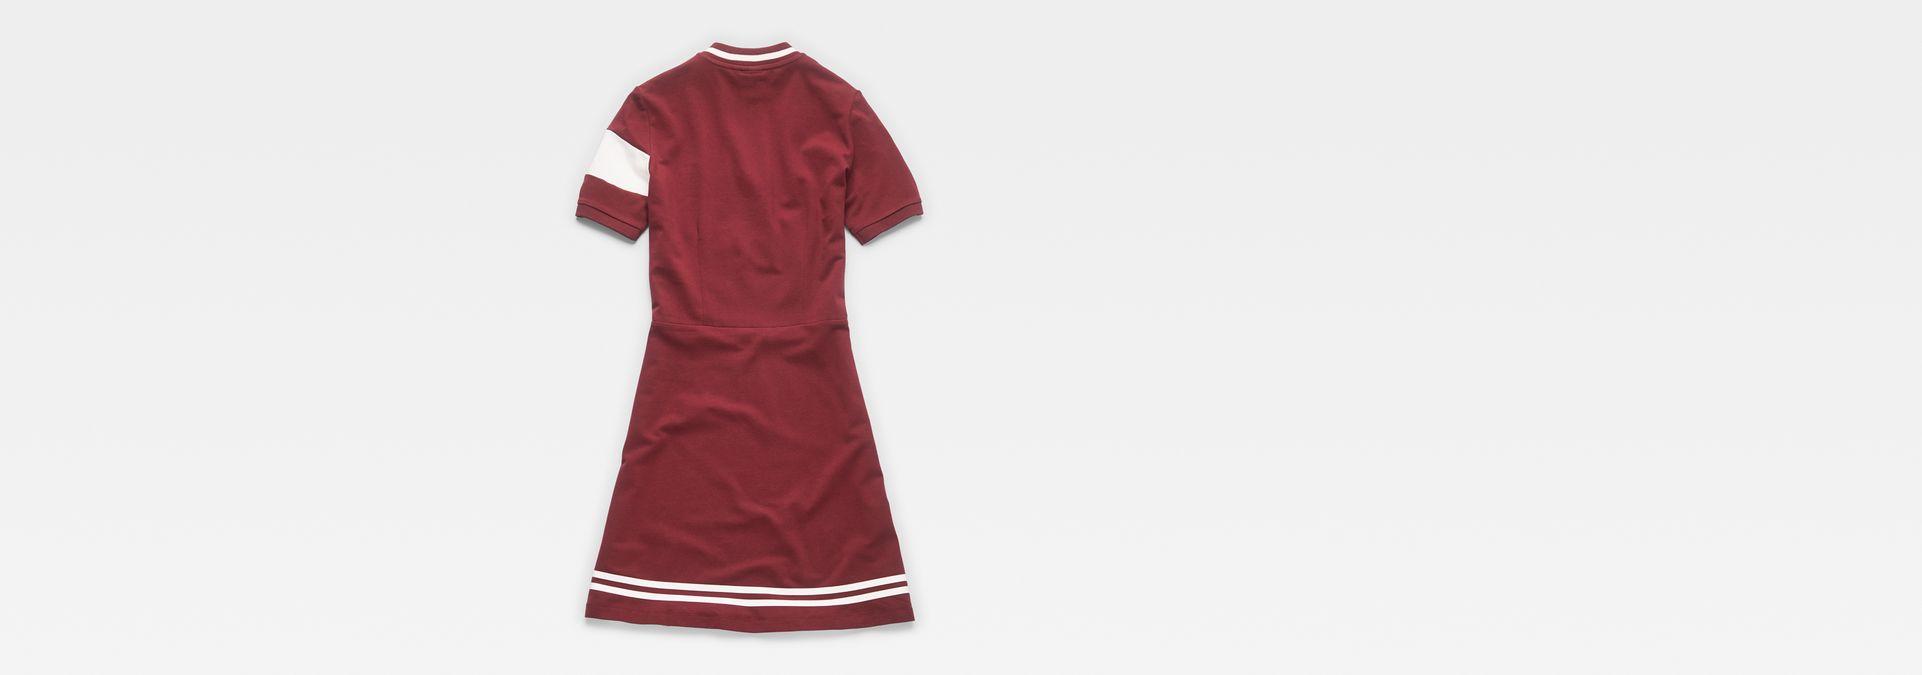 Slim Redmilk G Star Zip Raw® Mujeres DressPort Cergy TwZXiOPku